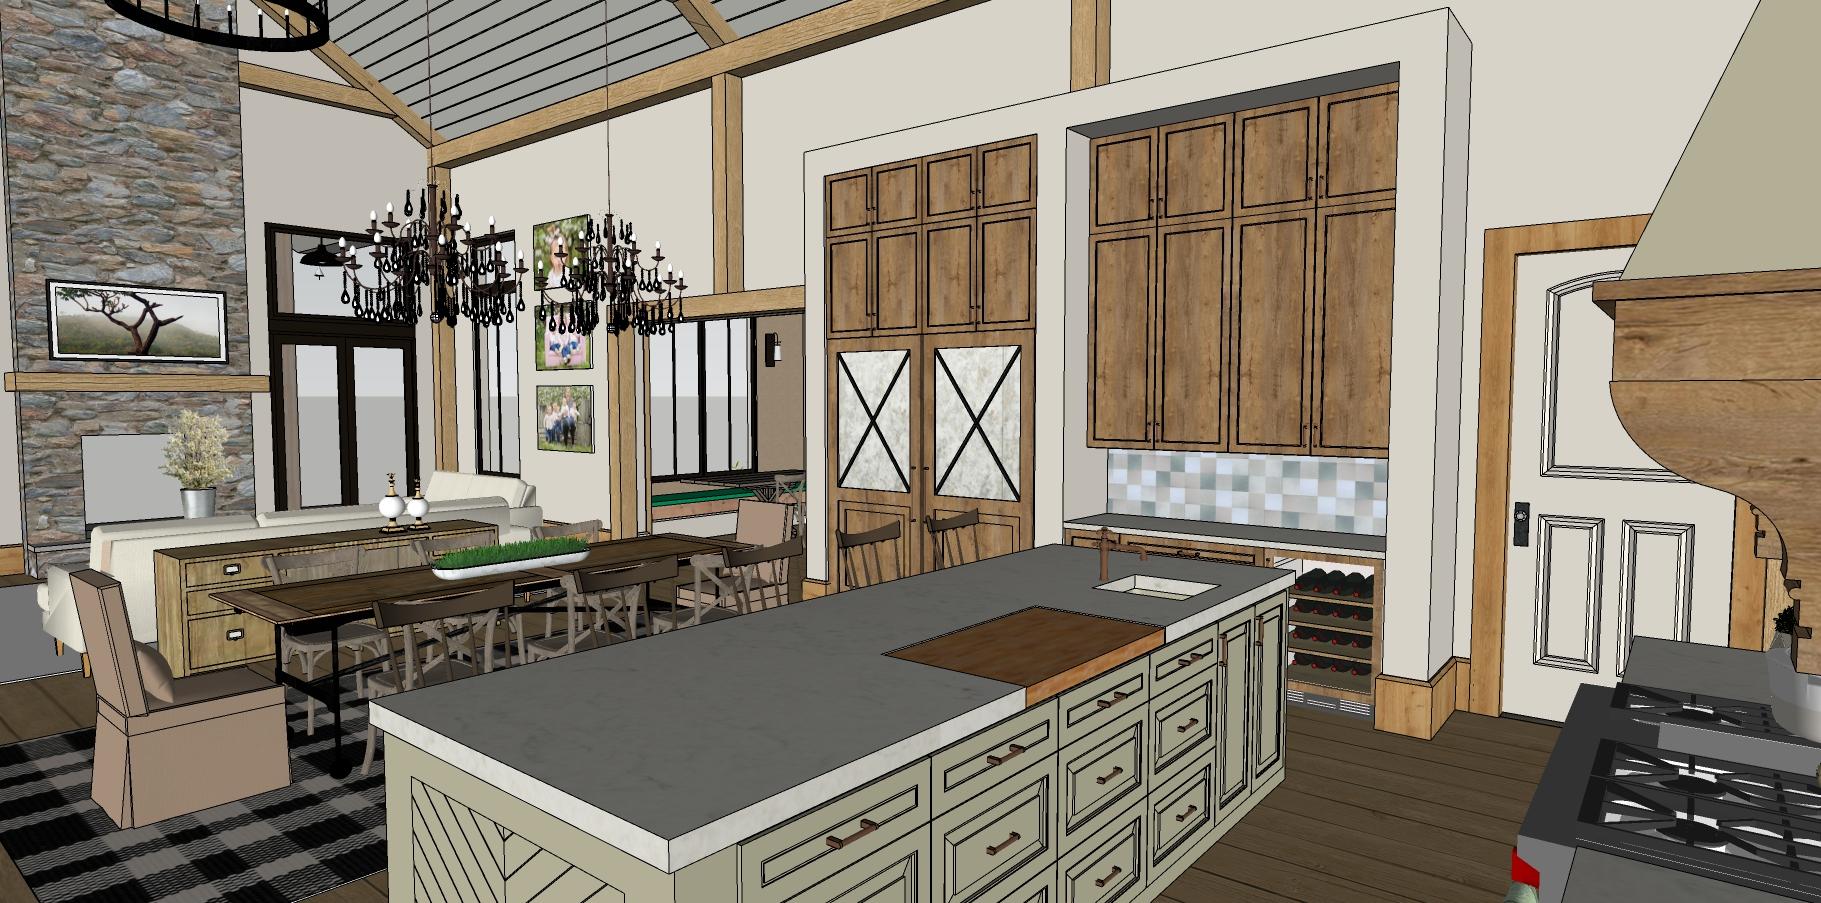 fuchsia-design-grand-rapids-kitchen-layout.jpg